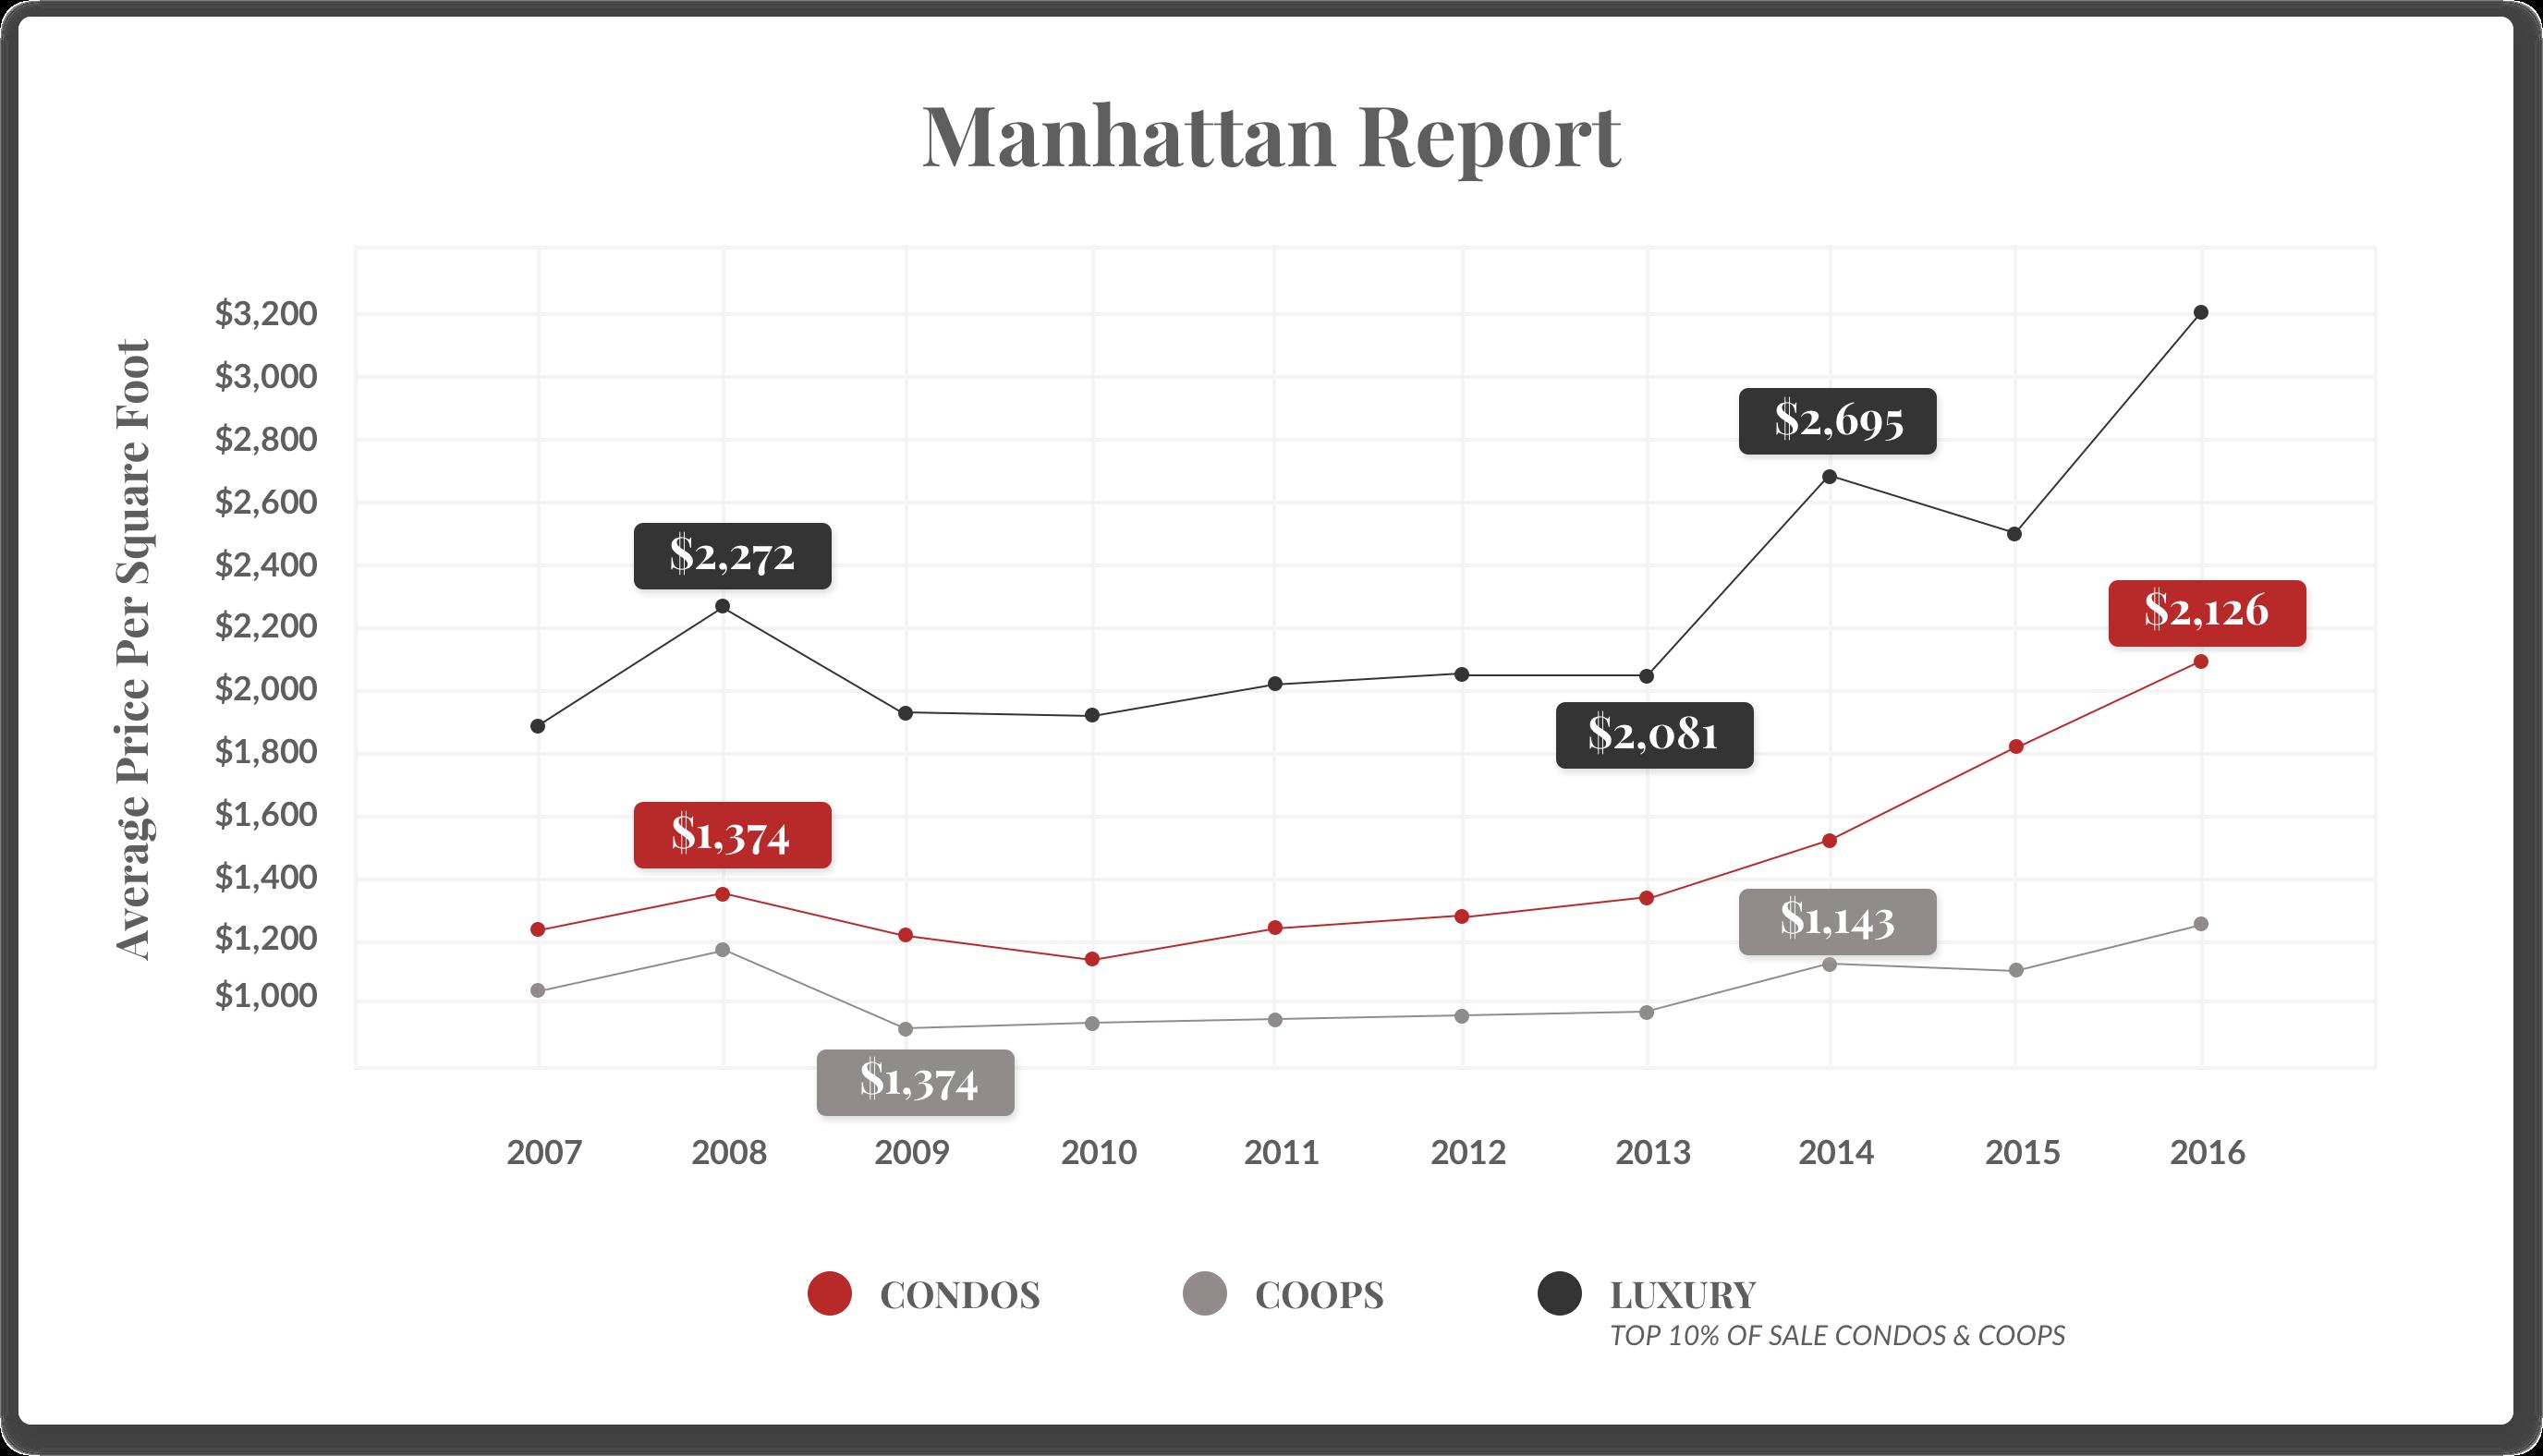 MANHATTAN REPORT